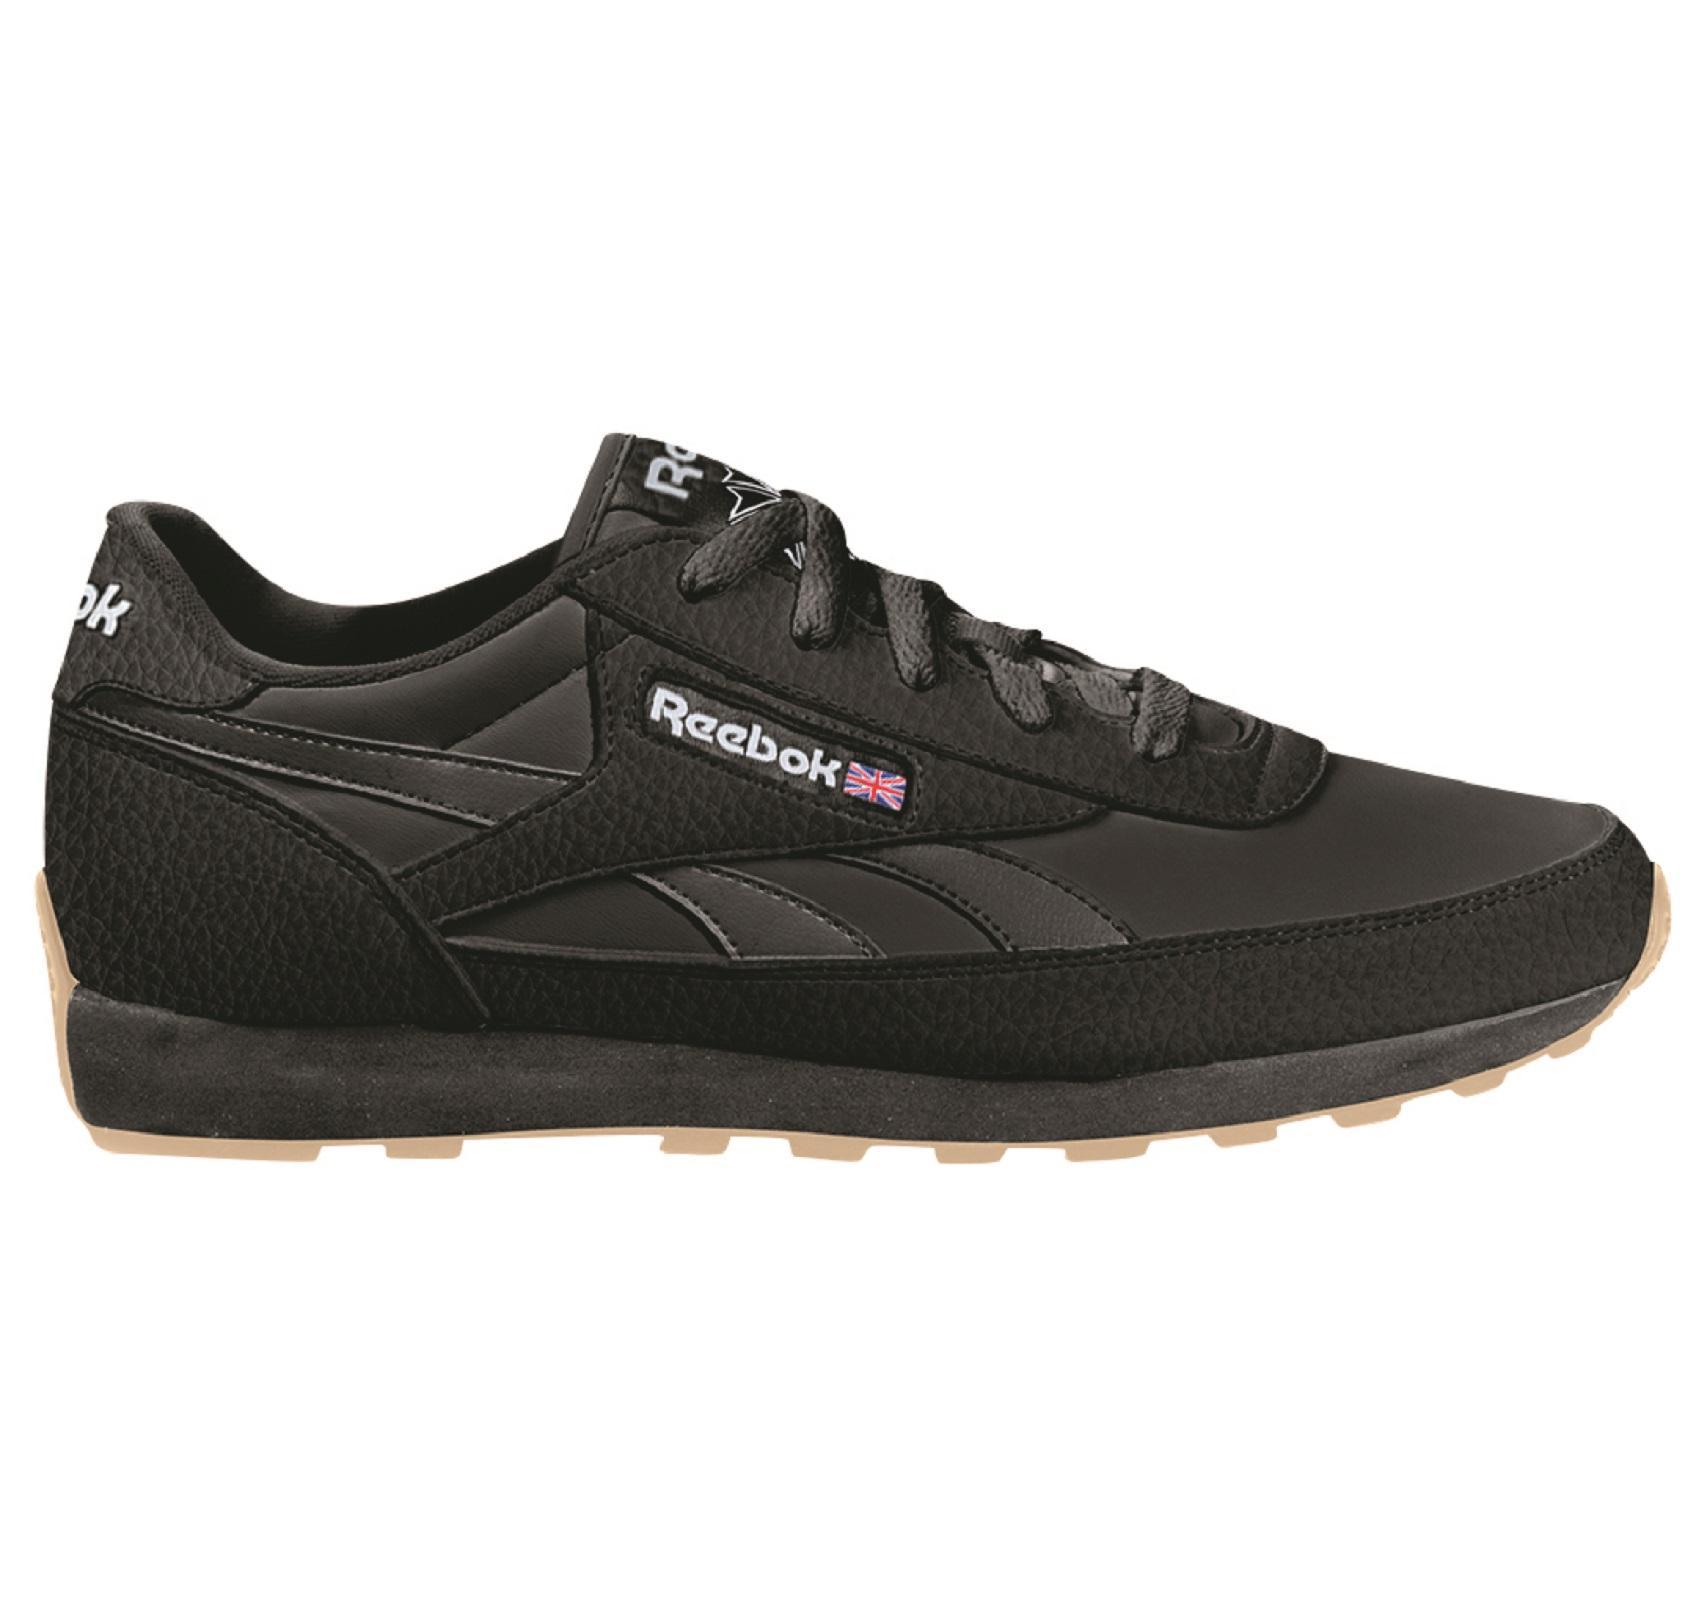 Reebok Men's Classic Renaissance Athletic Shoe - Black PartNumber: 076VA95838012P MfgPartNumber: V67369